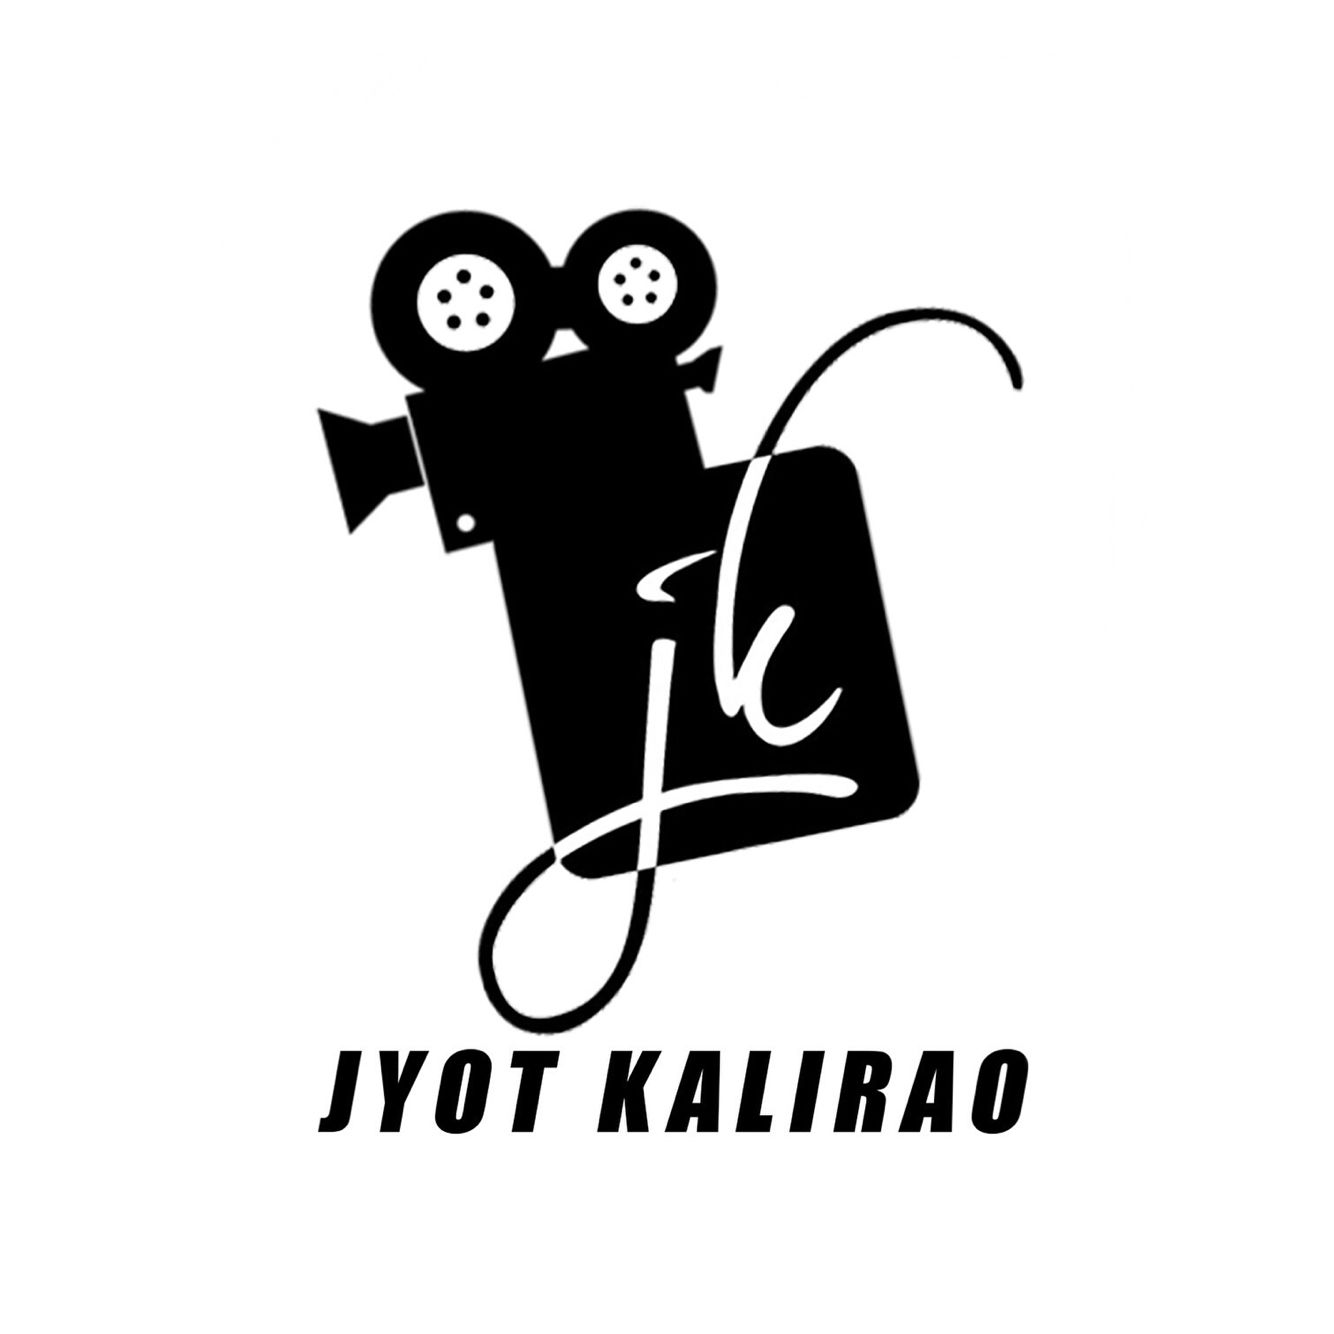 Jyot Kalirao Logo Music Video Director Cinematographer Film Maker Music Logo Graphic Design Services Logo Design